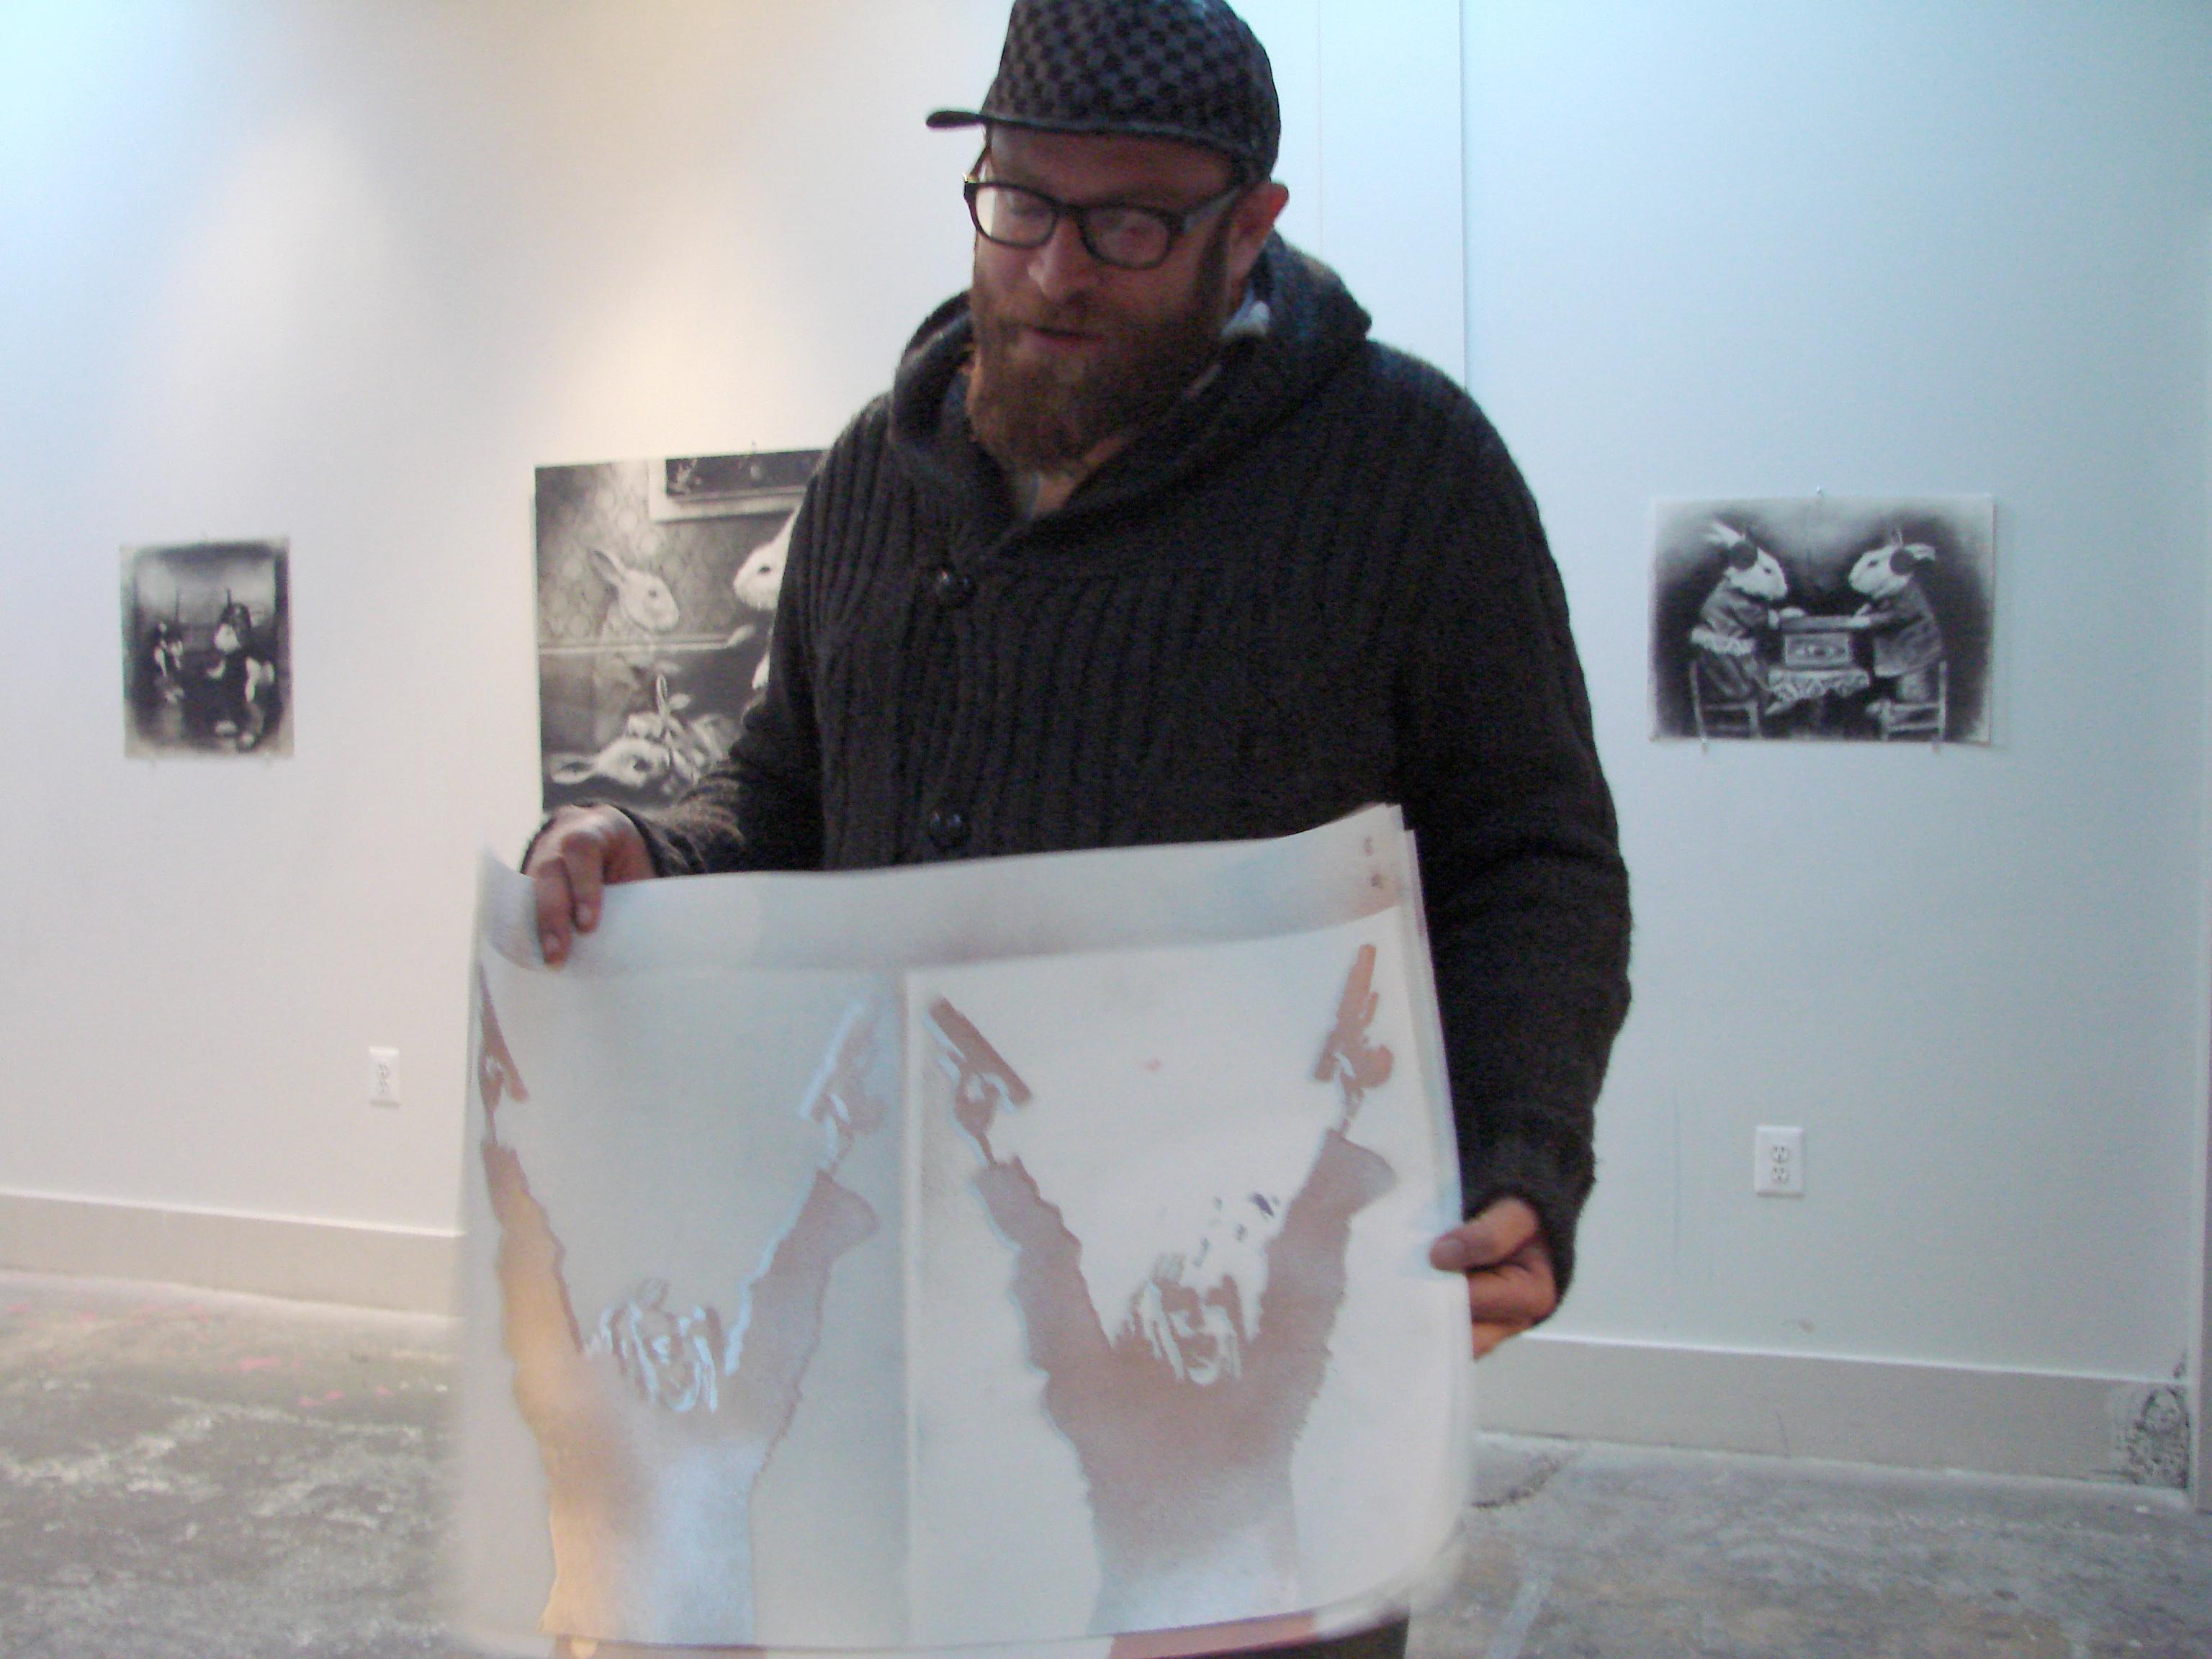 Slice of Life: Alex Goldstein, keeper of D.C.'s graffiti art scene